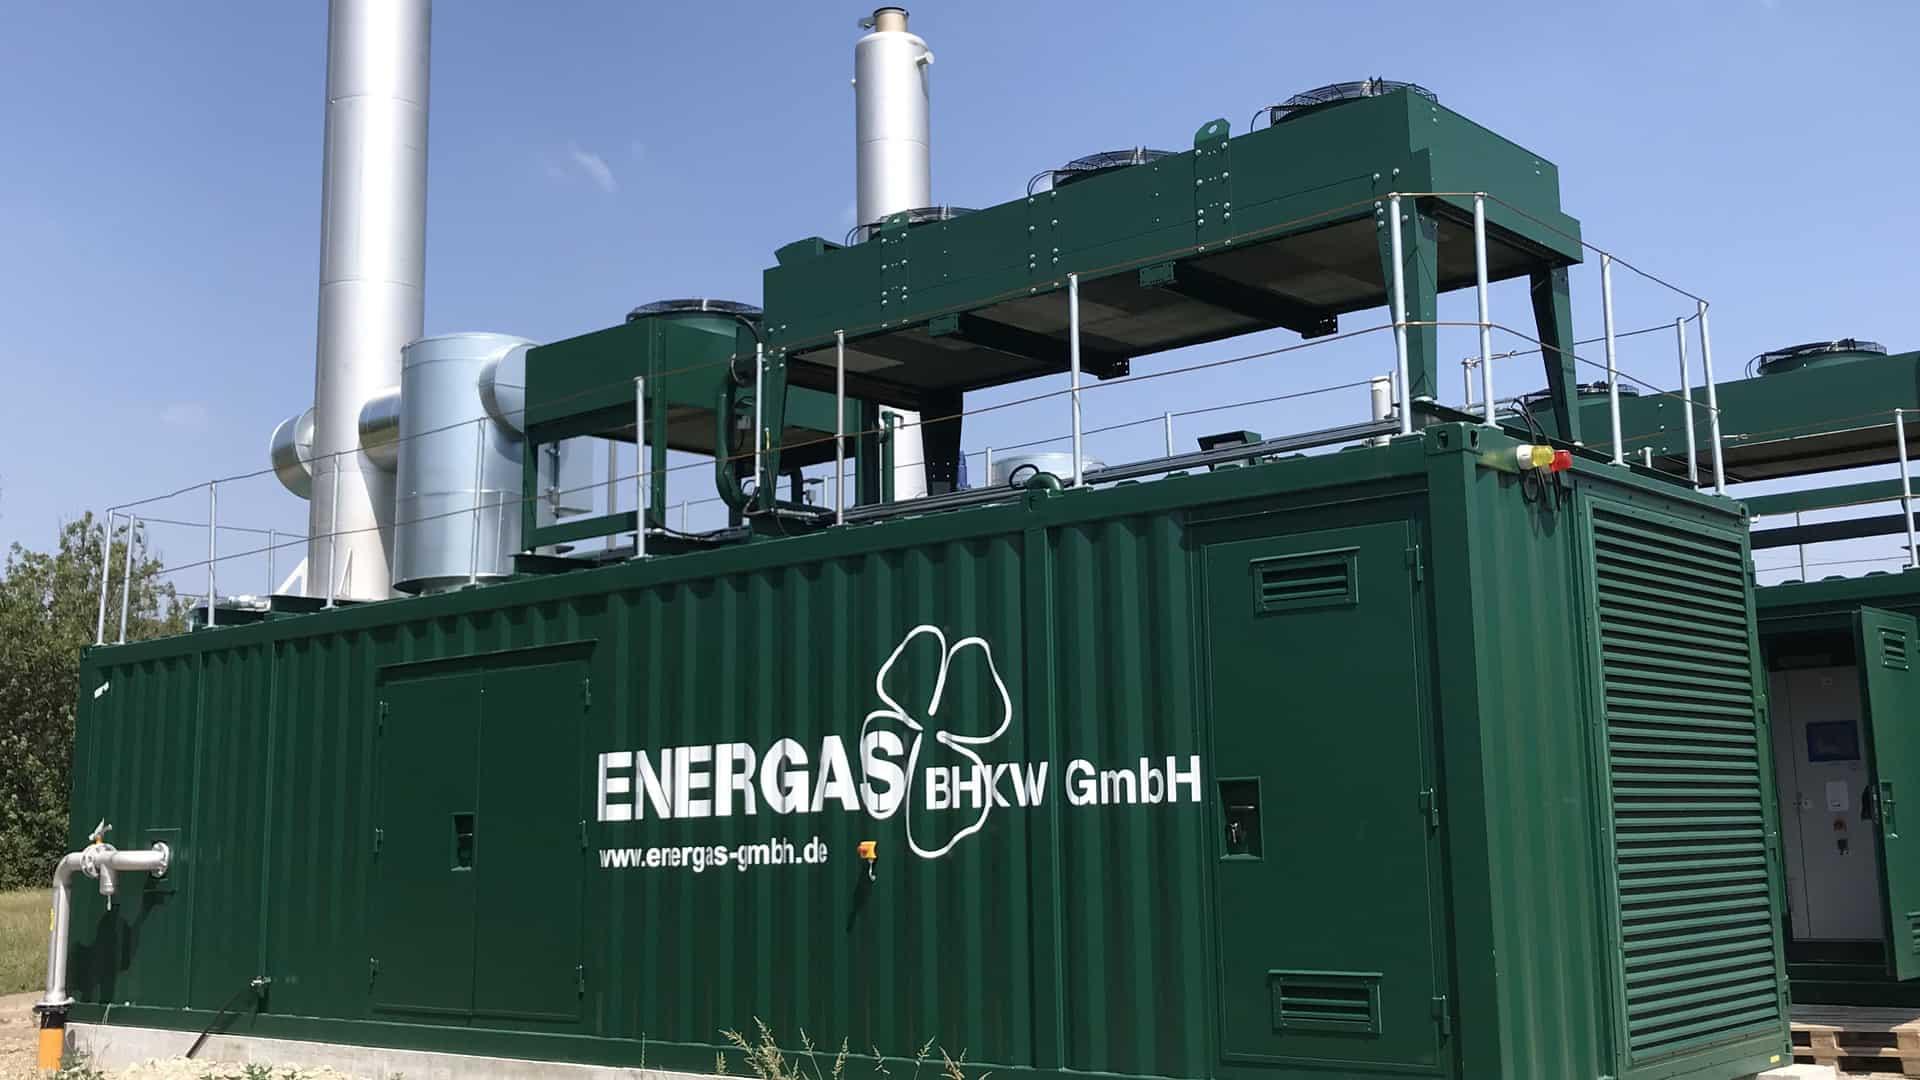 energas bhkw-containeranlage